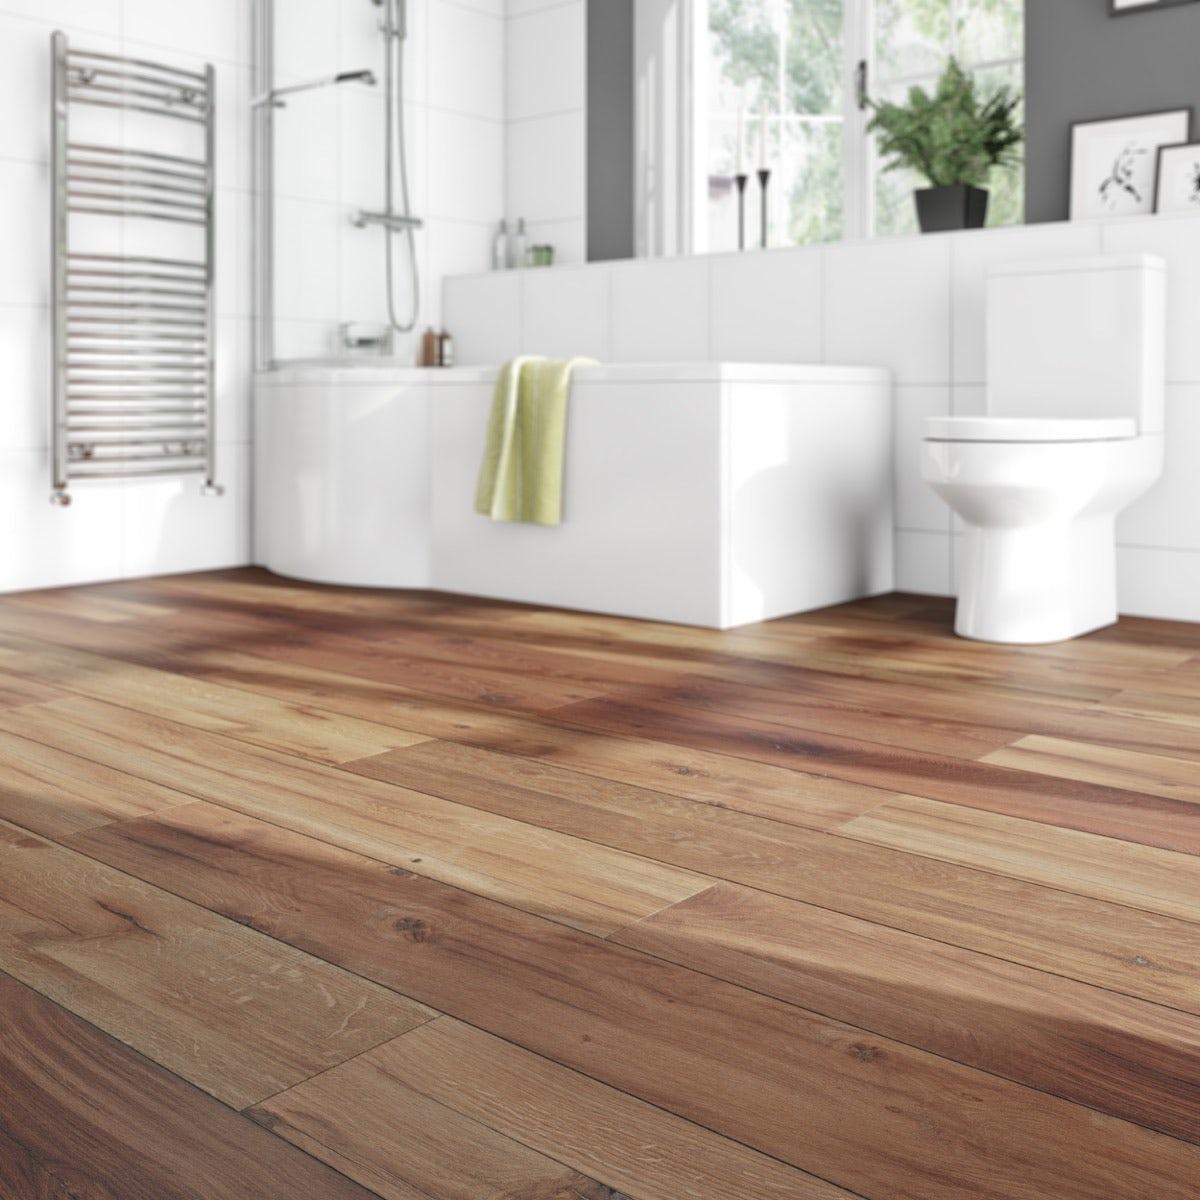 Krono Xonic Tortuga waterproof vinyl flooring